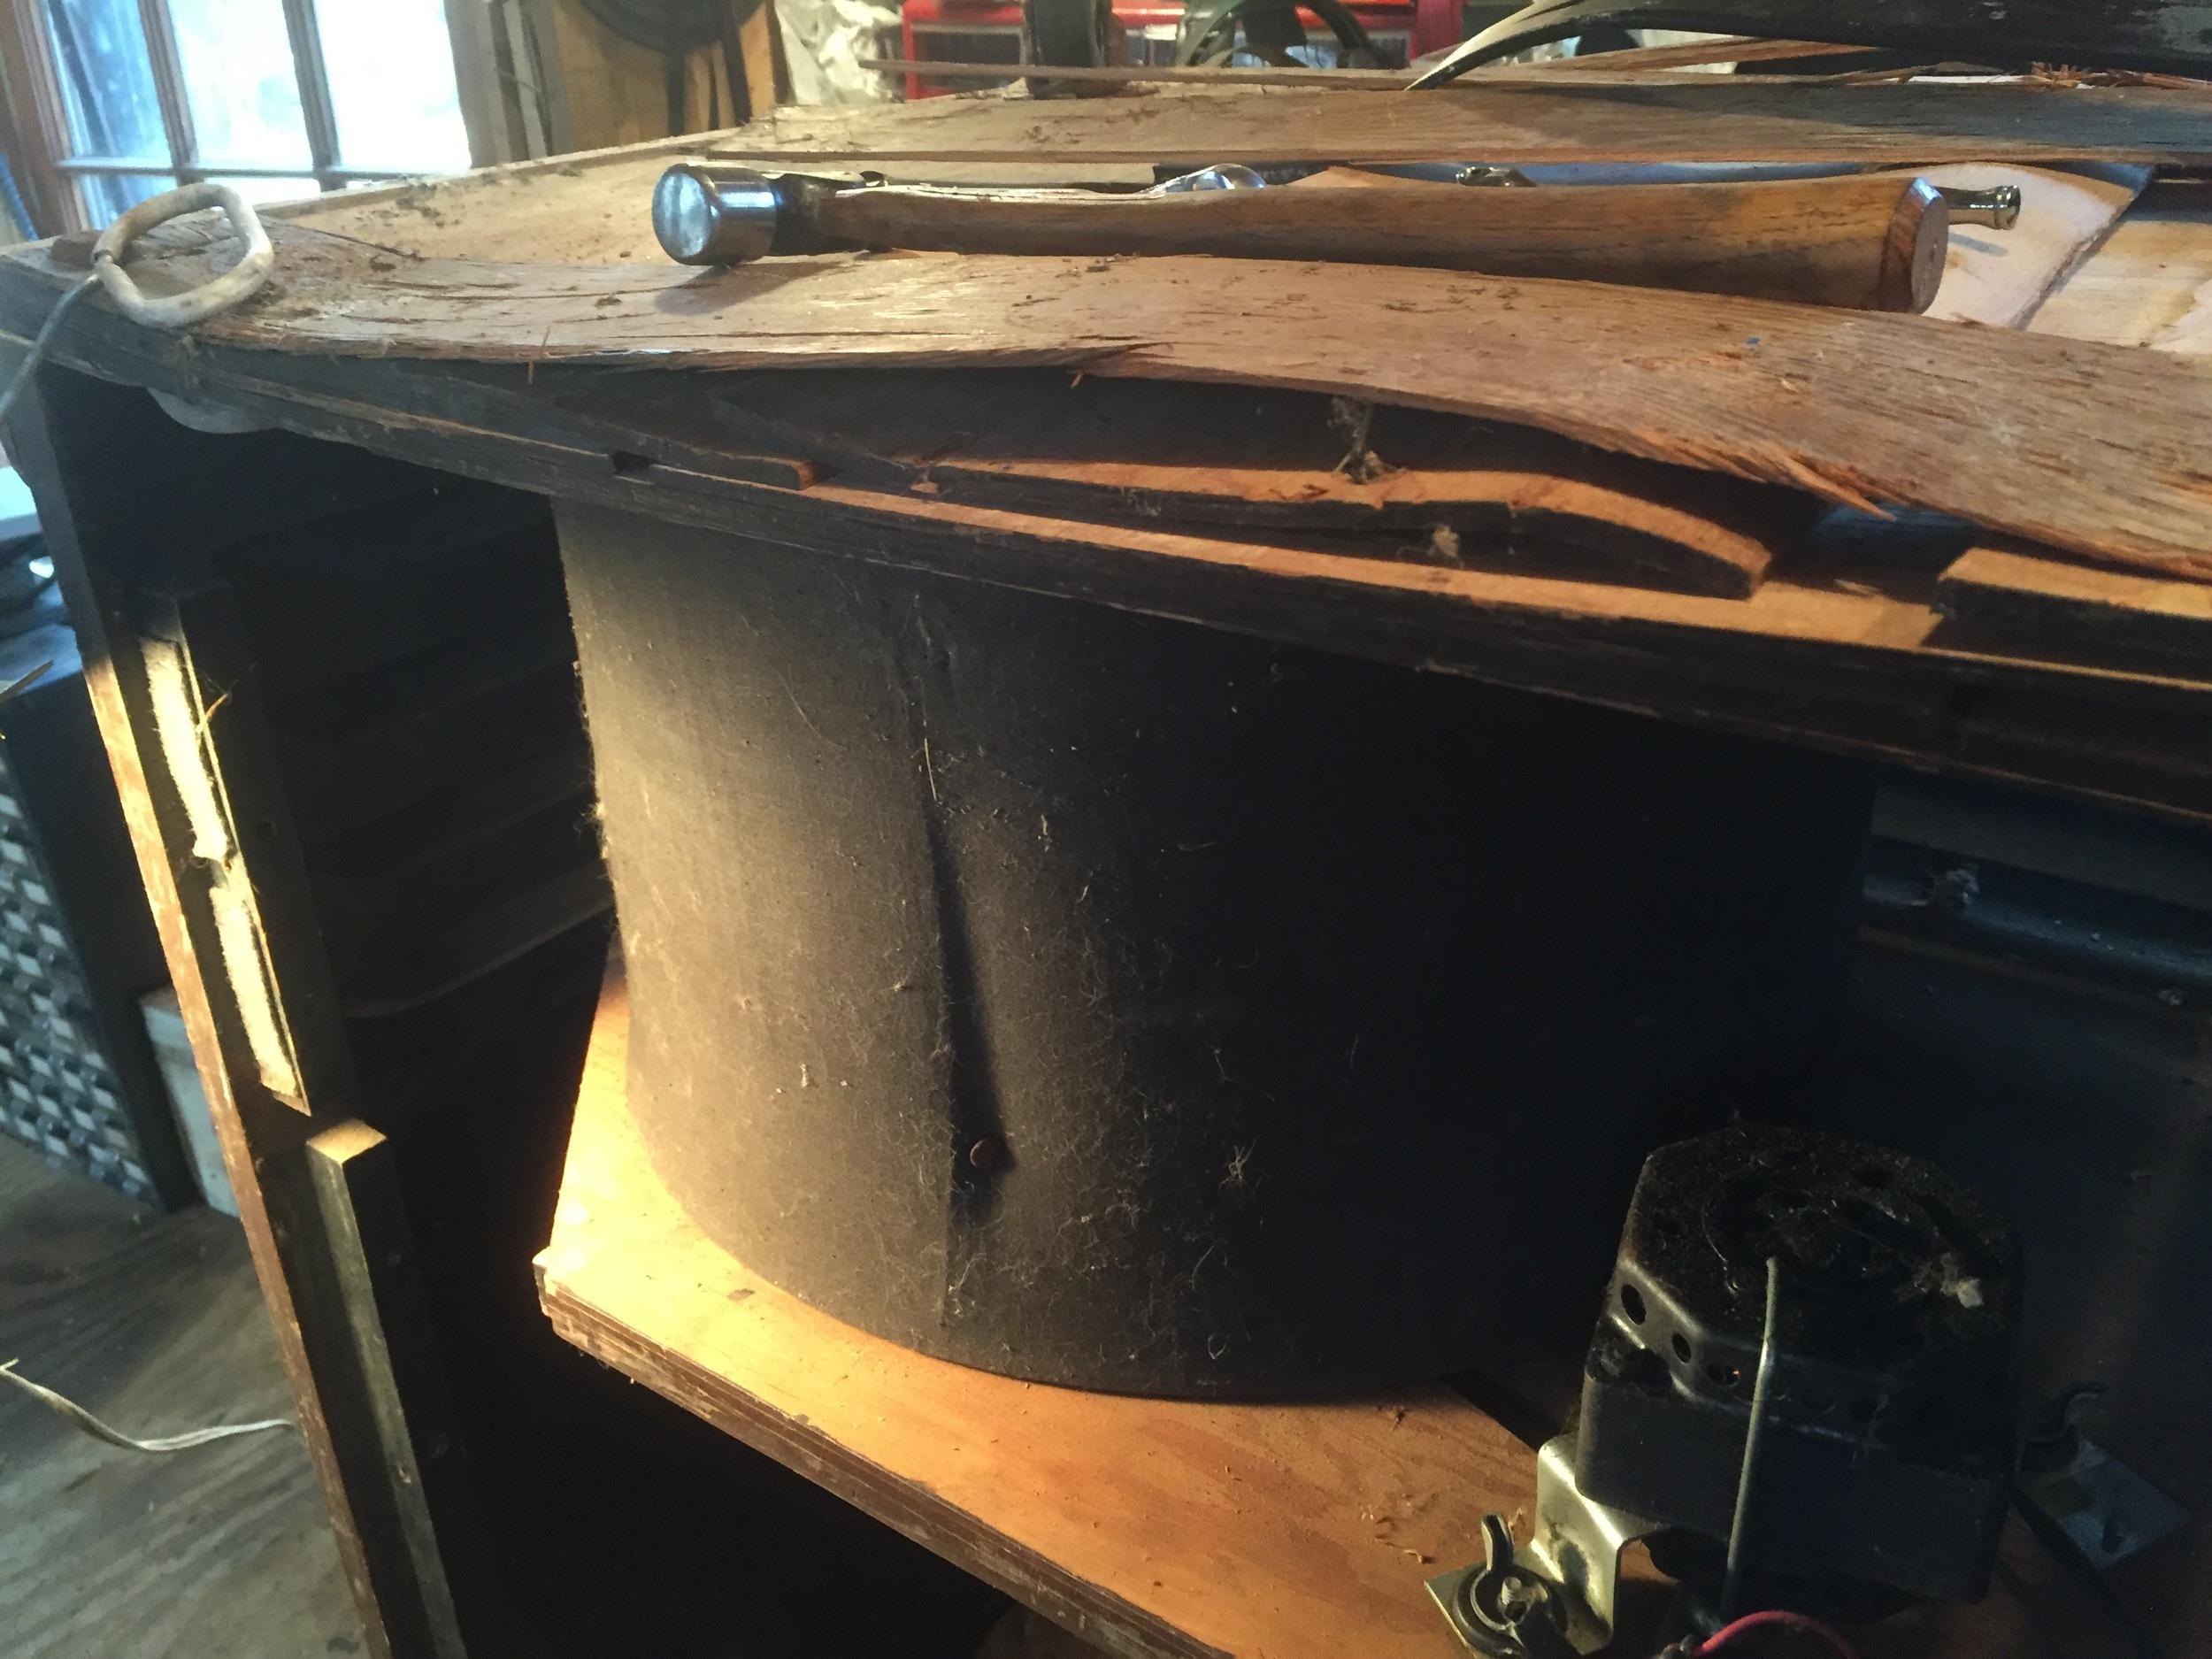 Bottom plywood is badly delaminated.